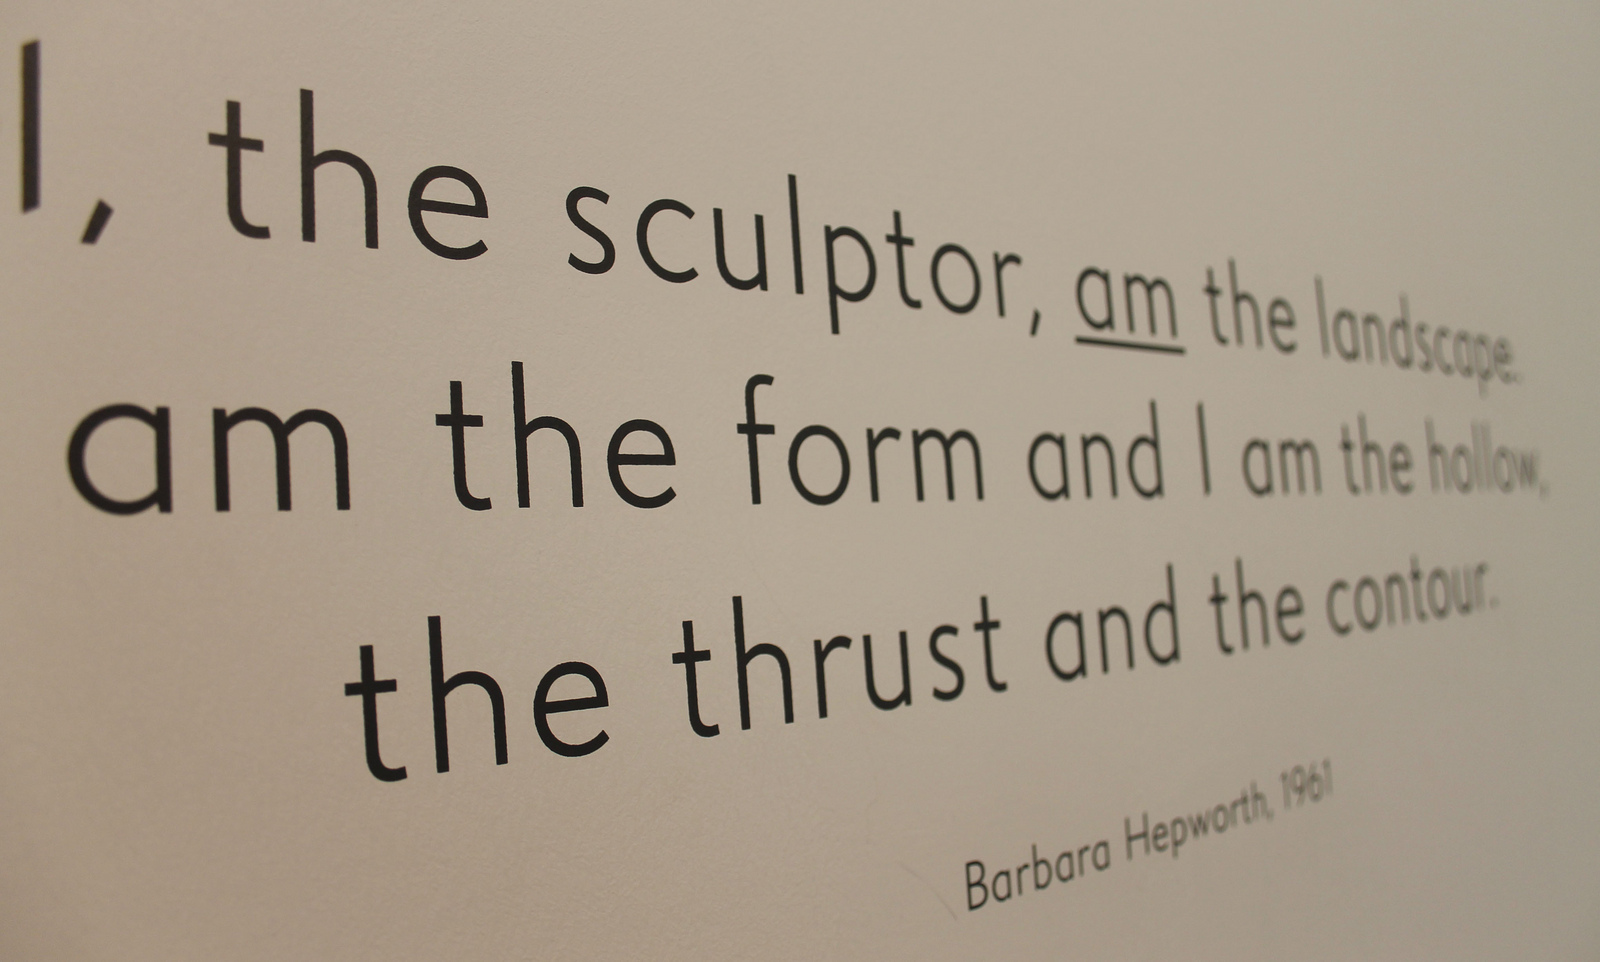 Barbara Hepworth's quote #1